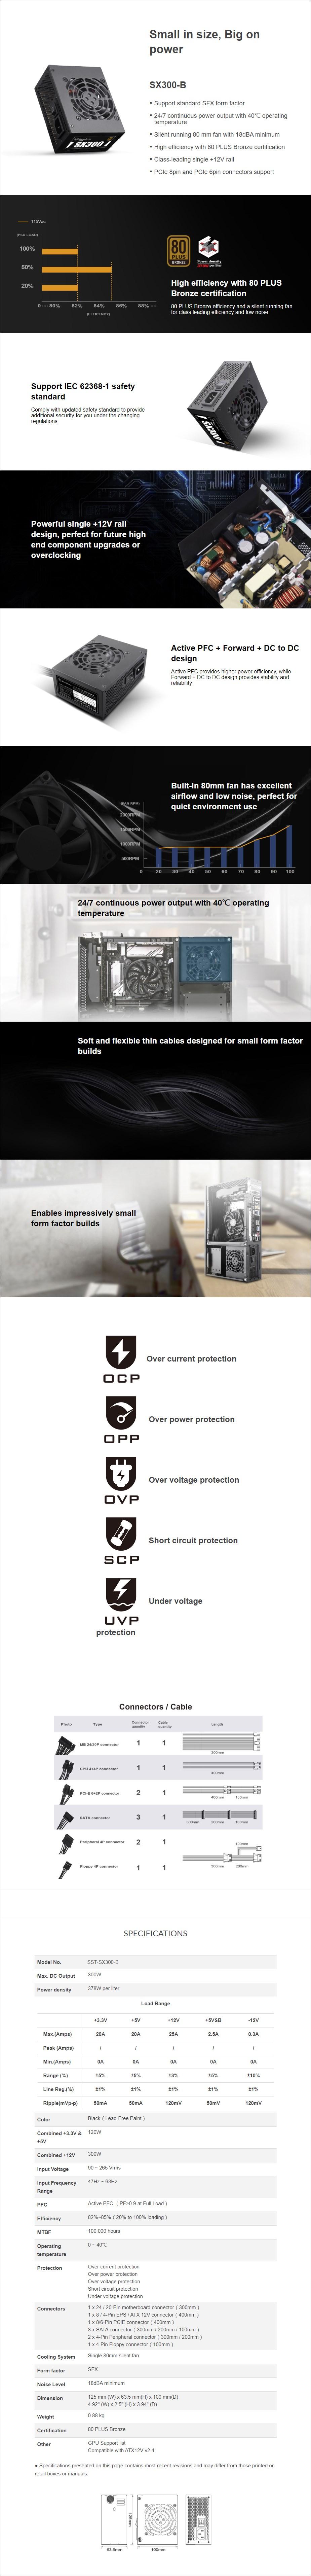 SilverStone SX300-B 300W 80+ Bronze SFX Power Supply - Overview 1